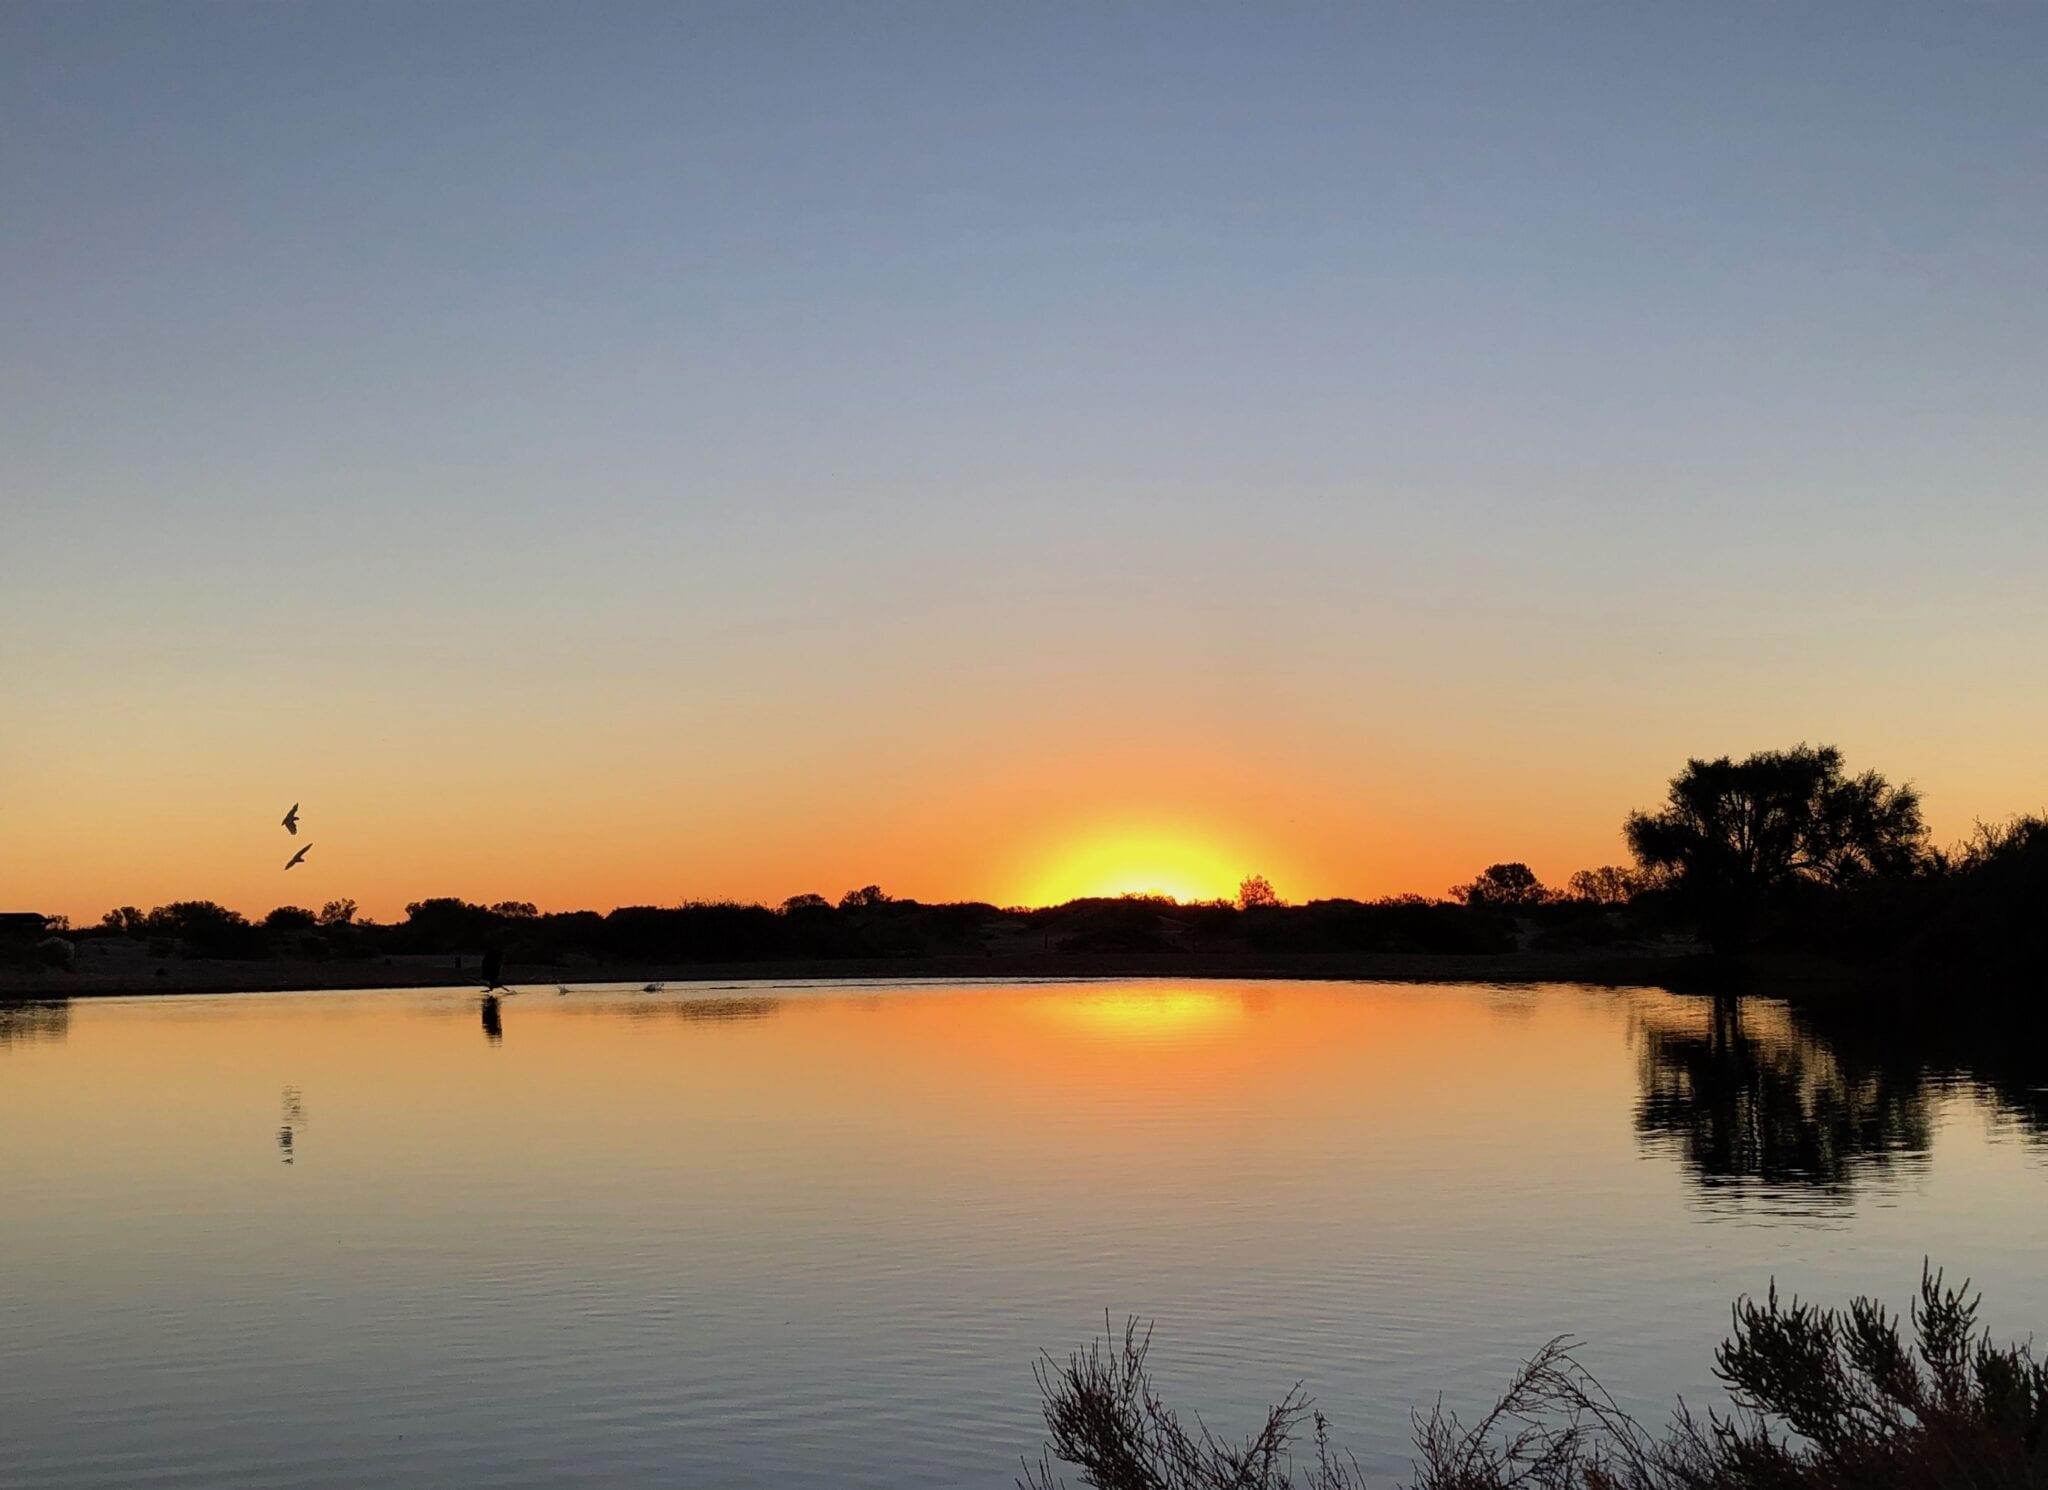 The sun setting over Montecollina Bore.